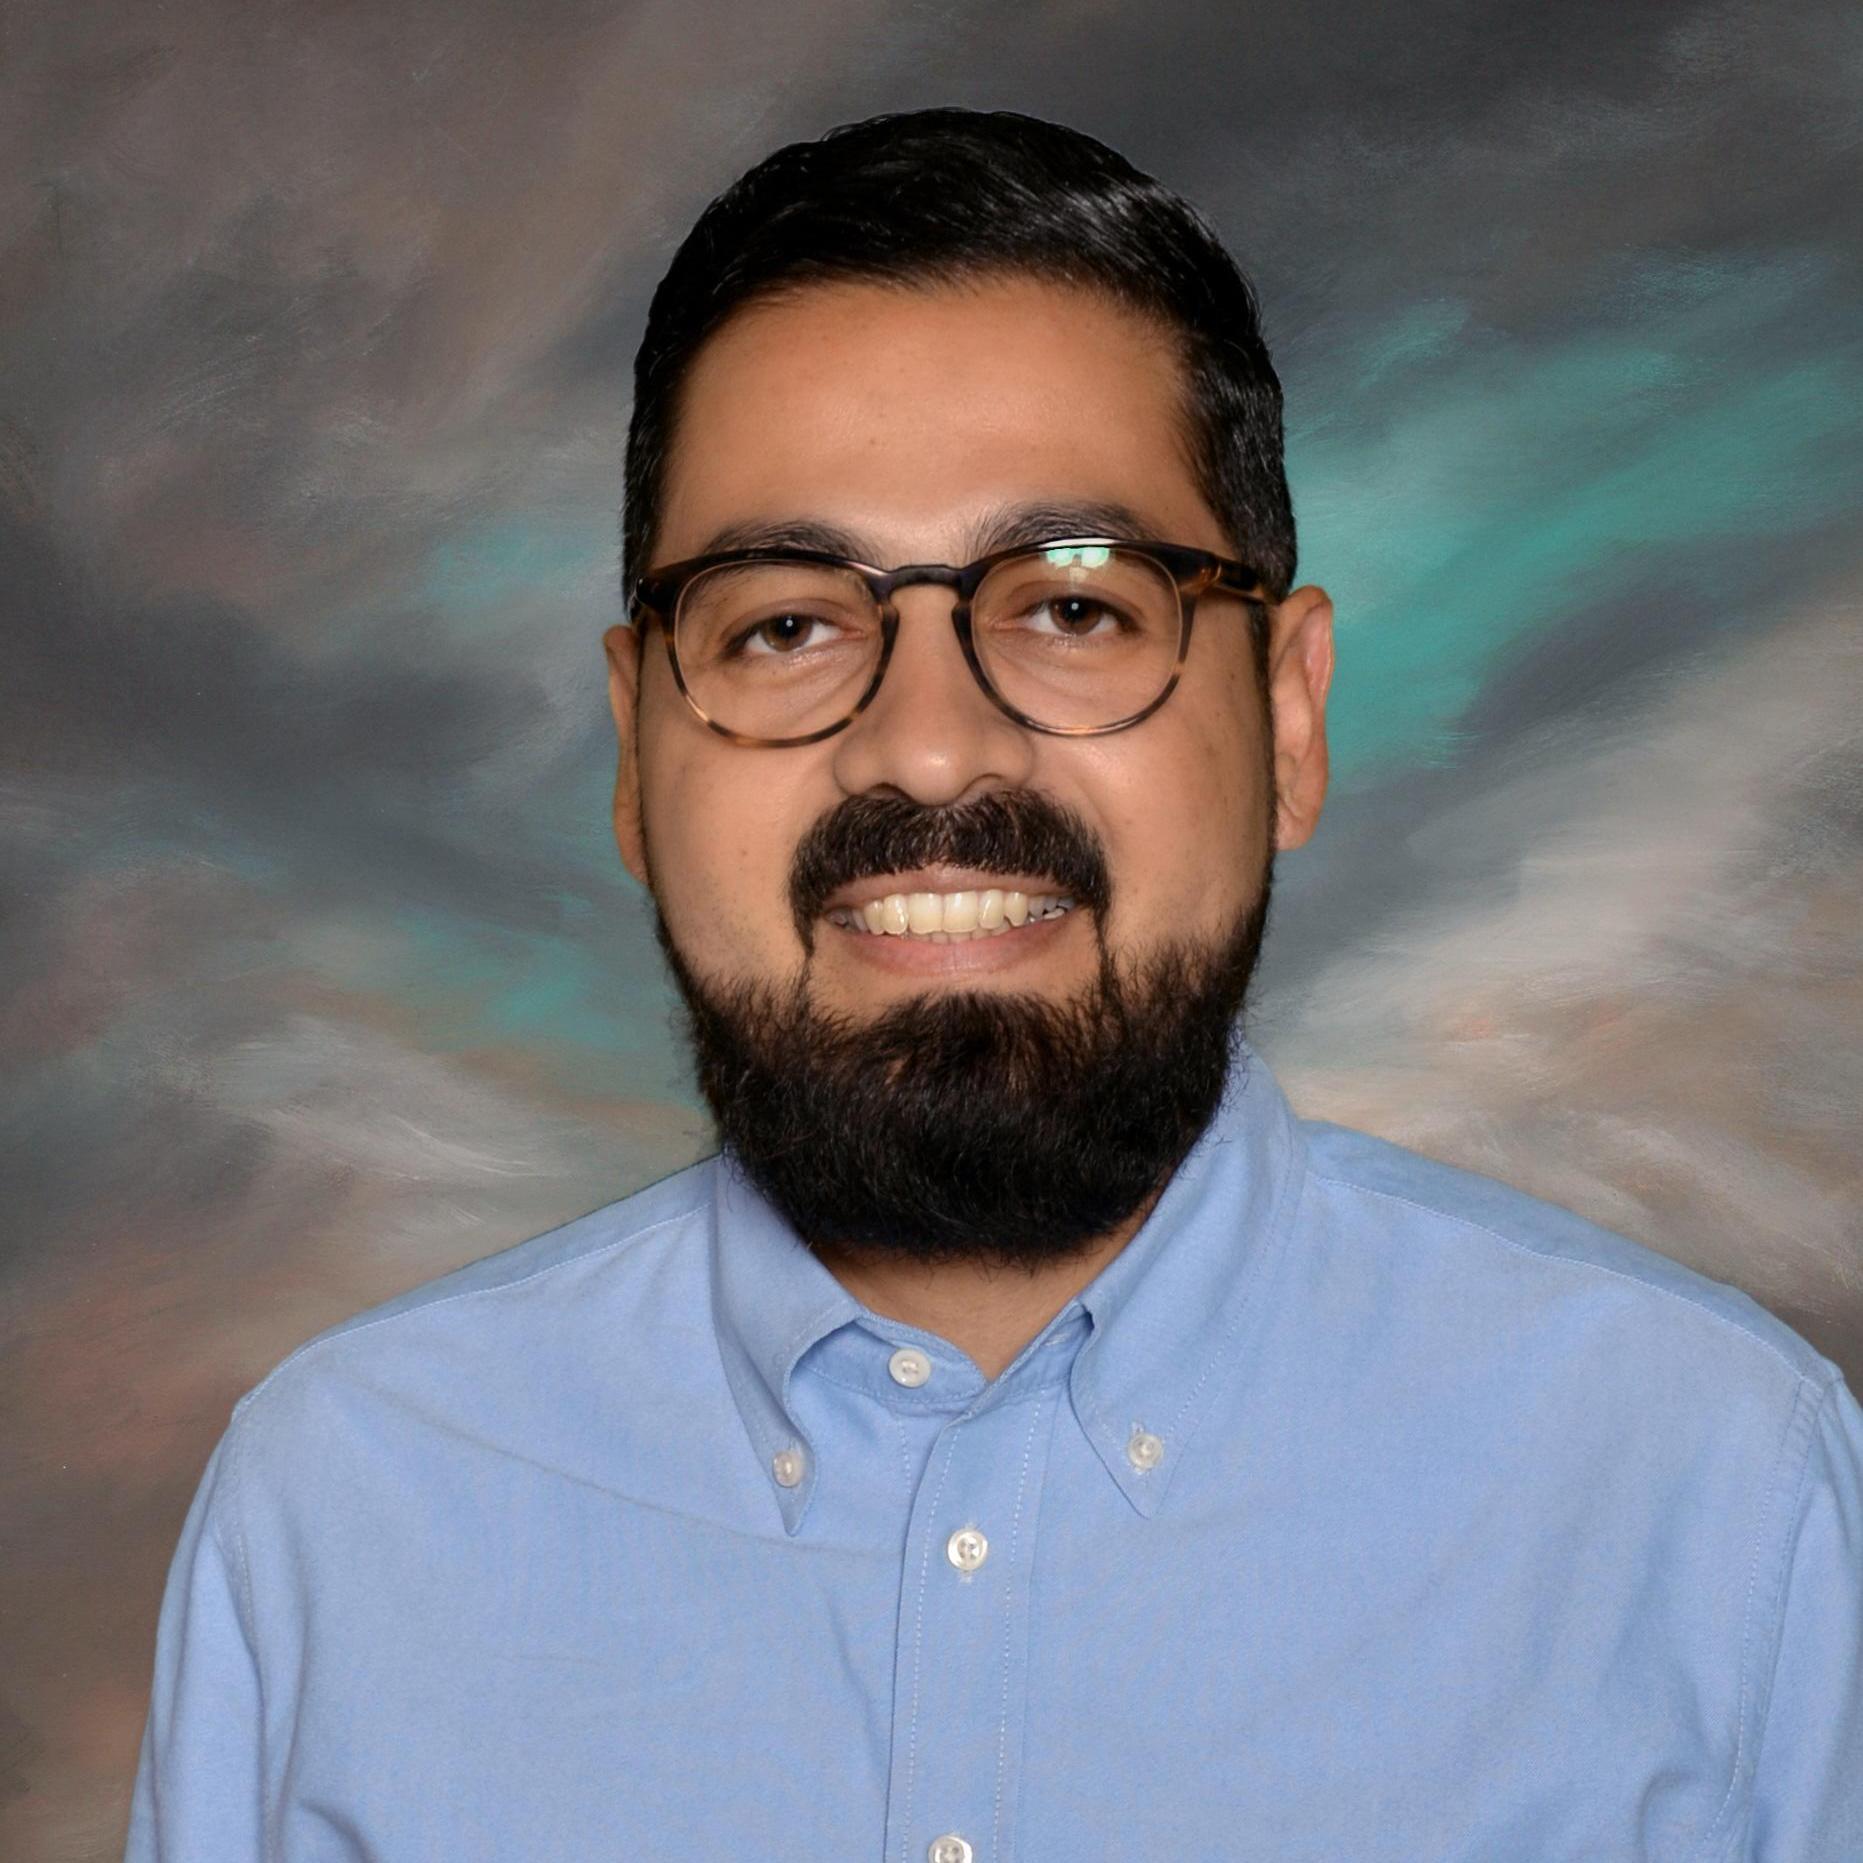 Jorge Segura's Profile Photo